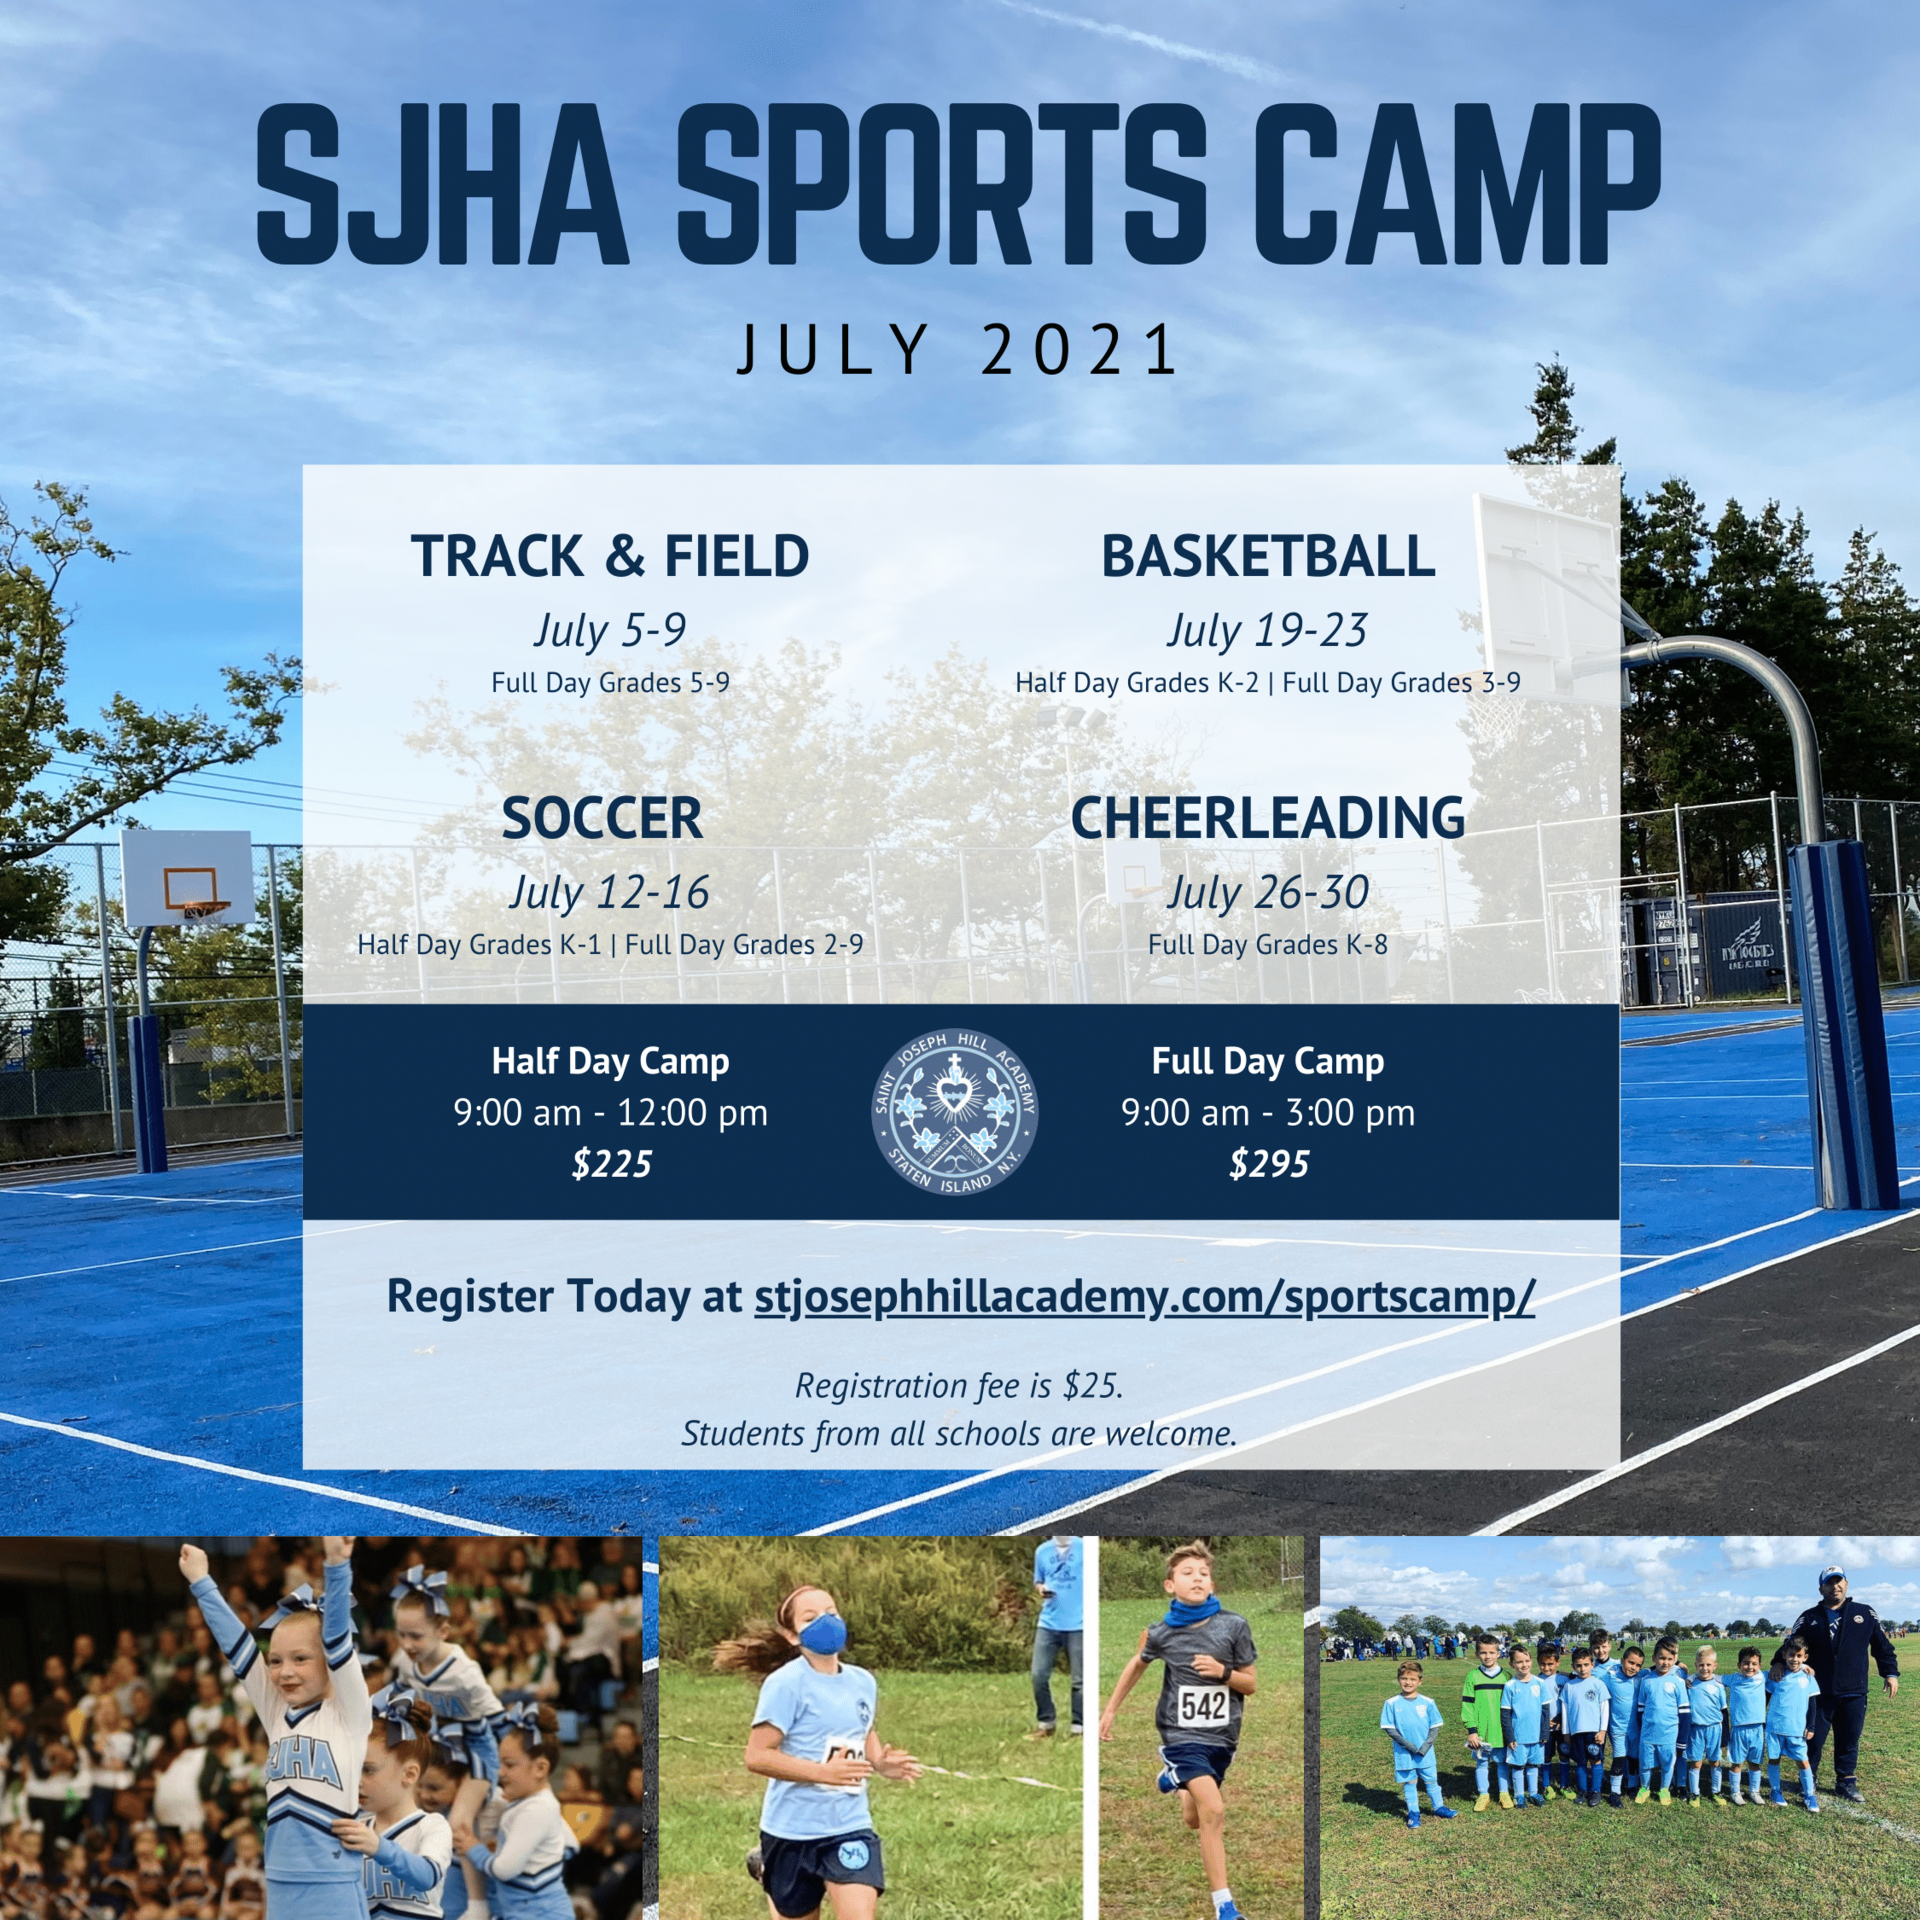 sjha sports camp